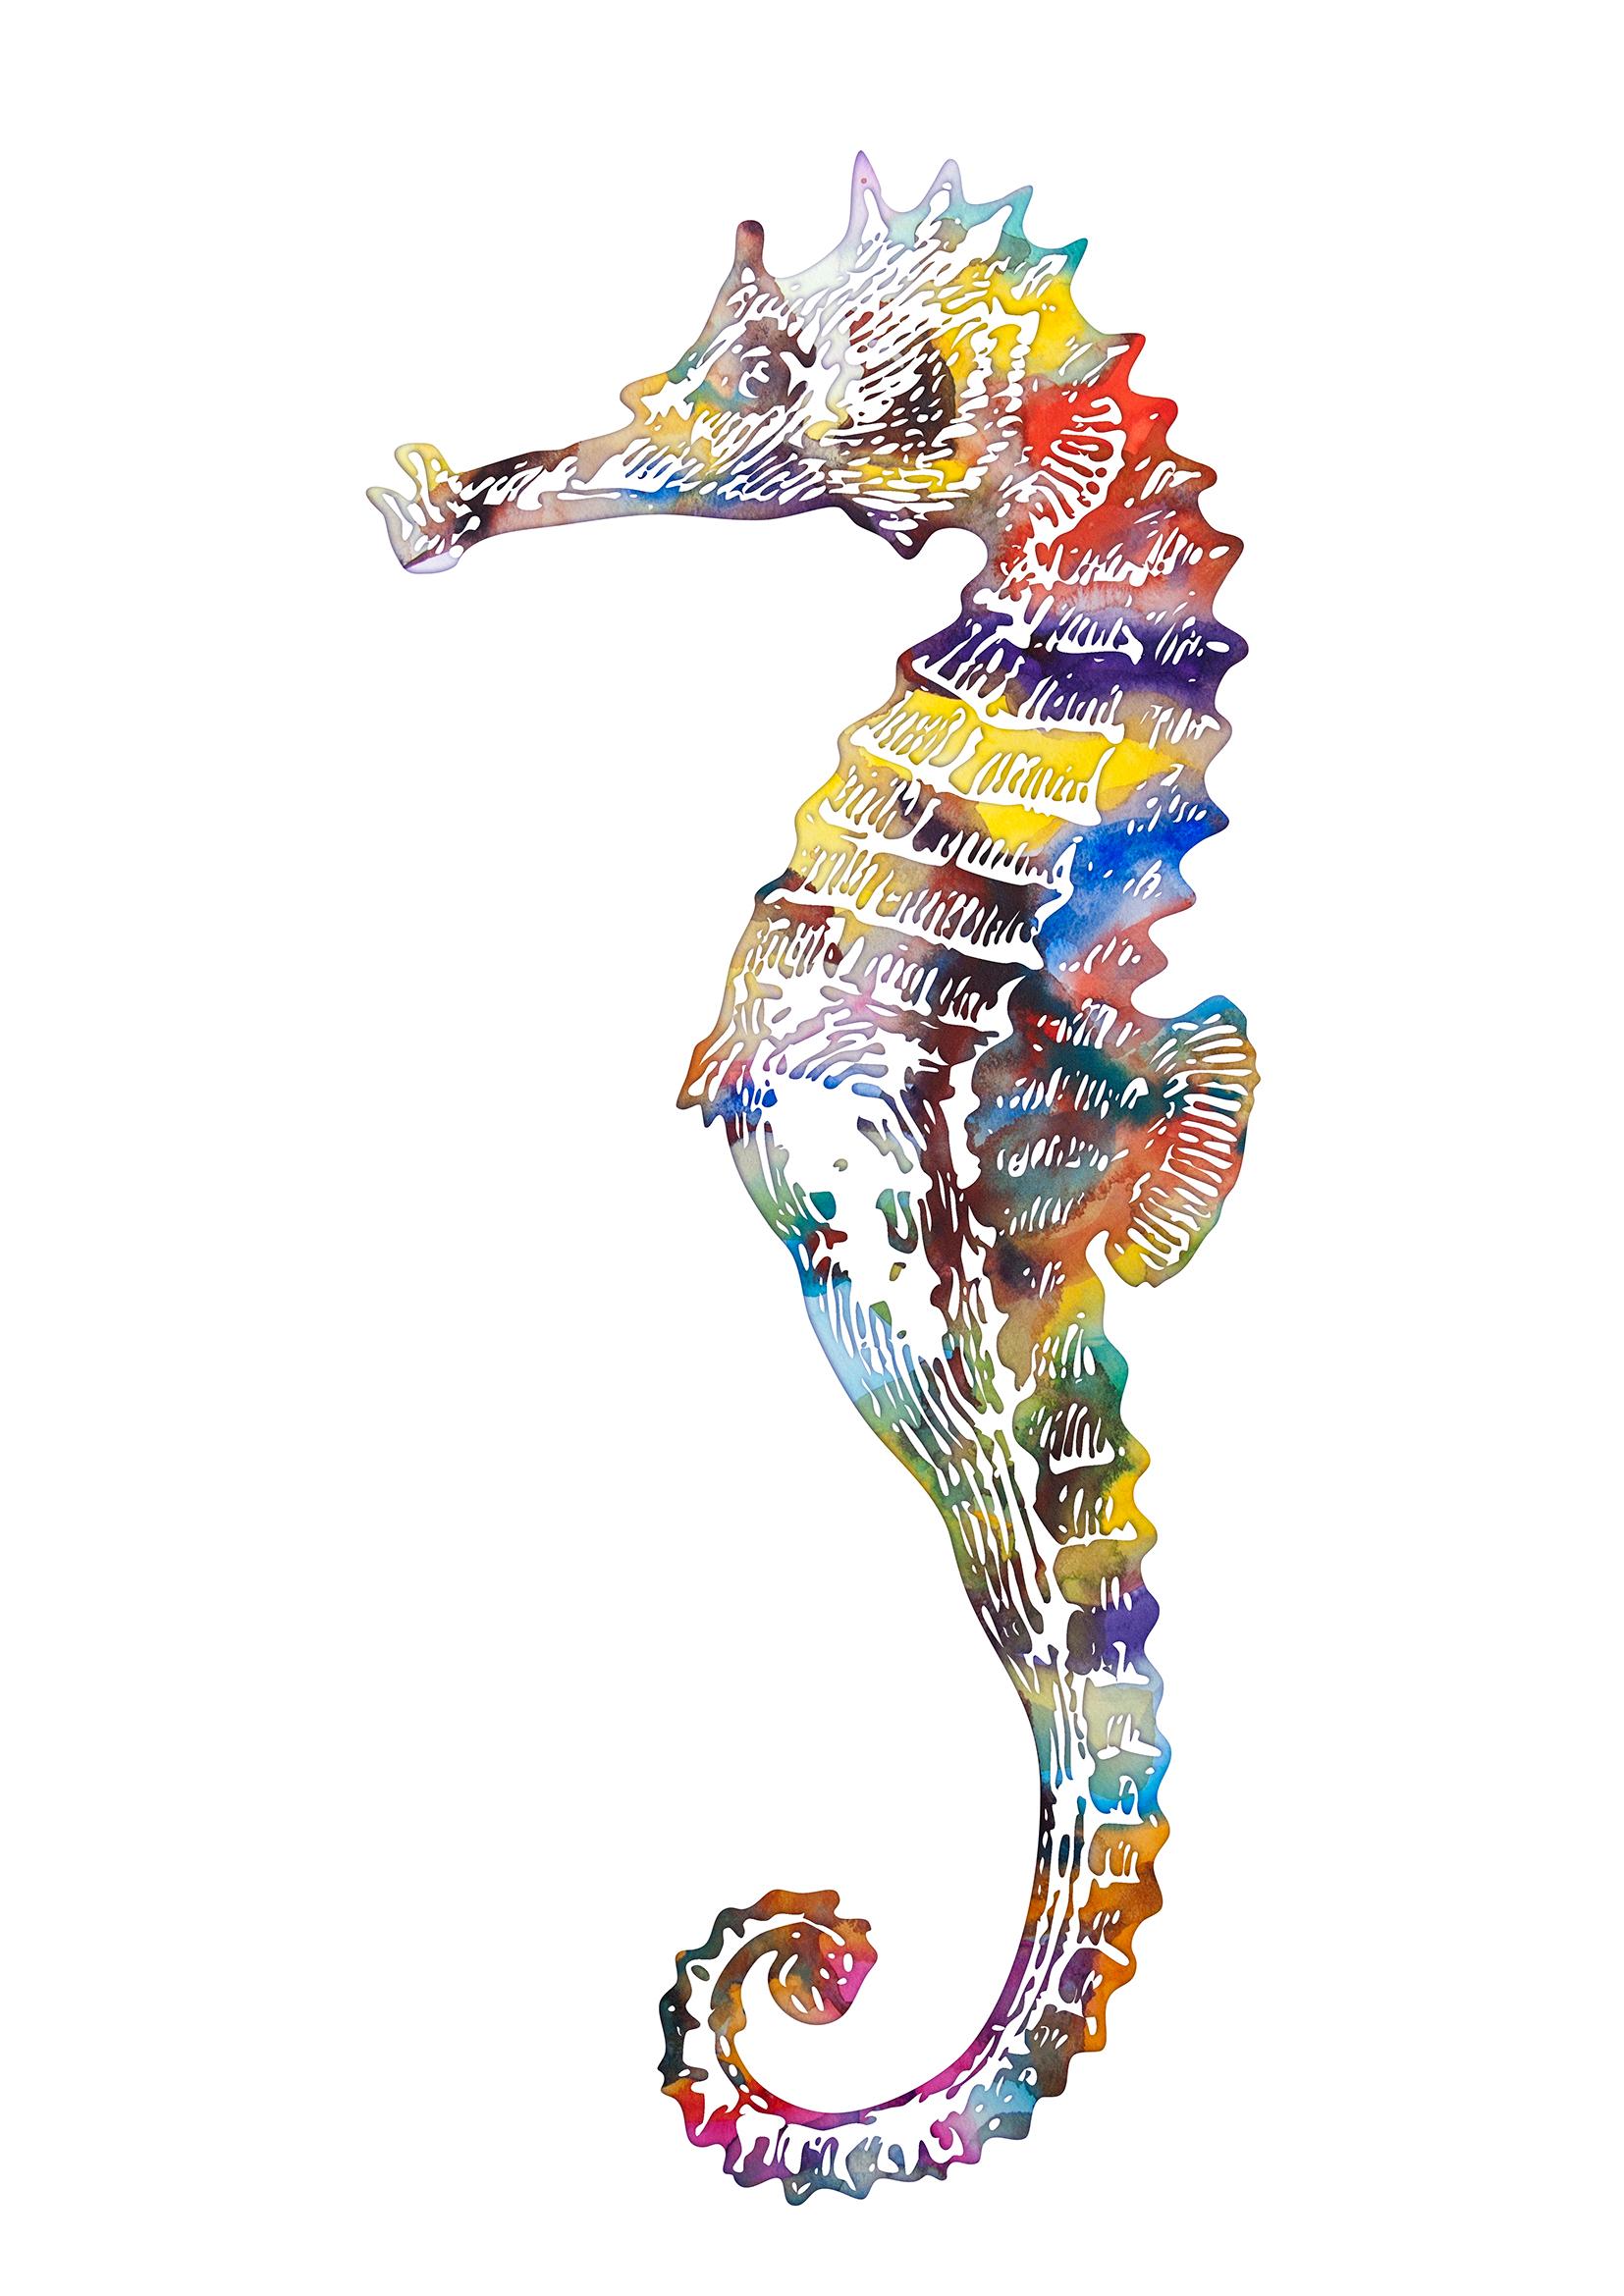 Beautiful Seahorse Downloadable Picture Watercolor Poster By Artollo